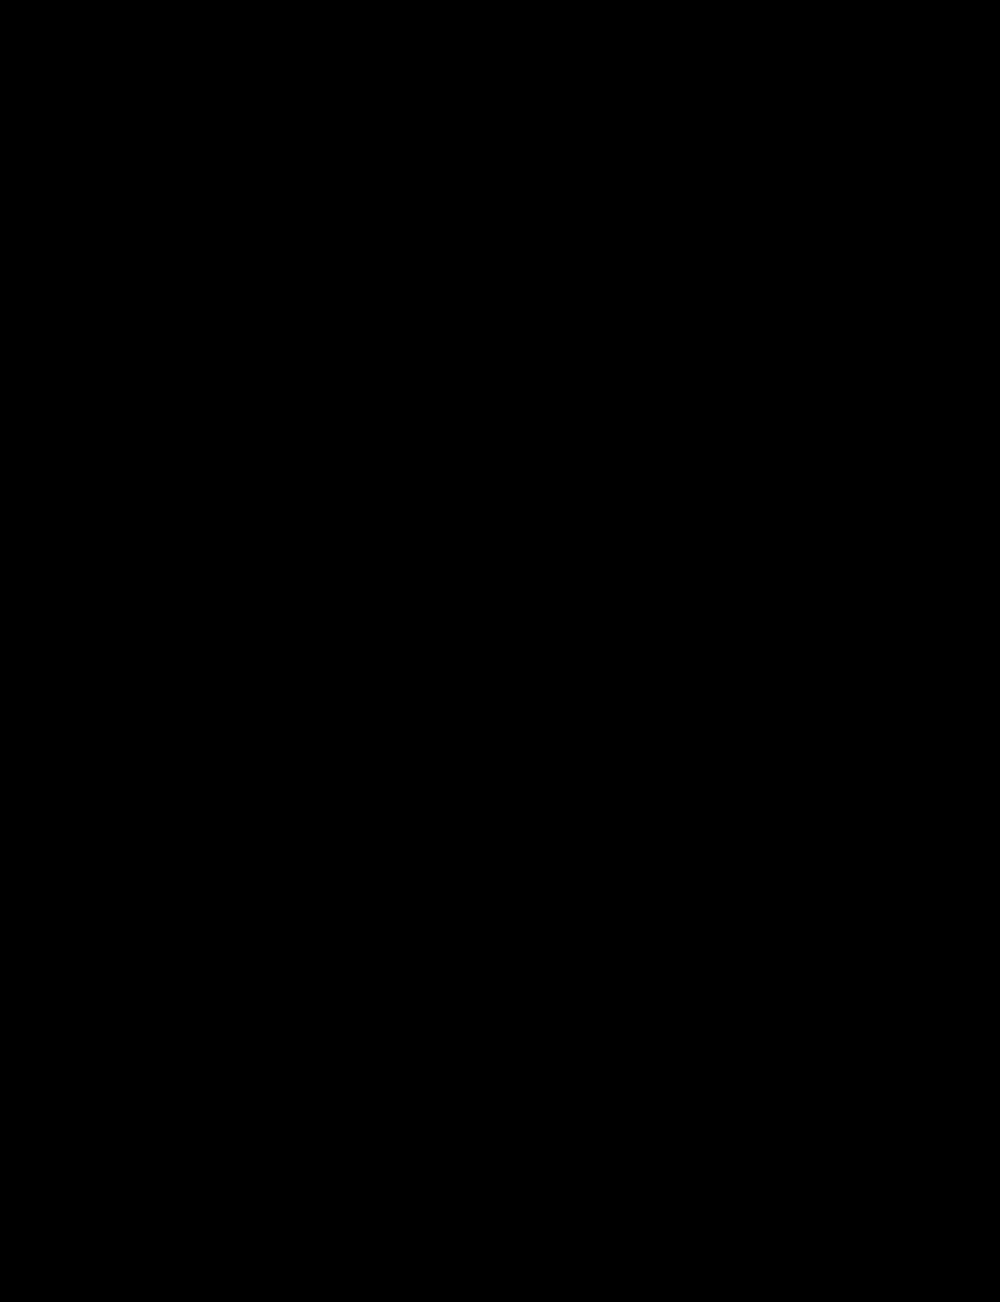 Le cabas bicolore